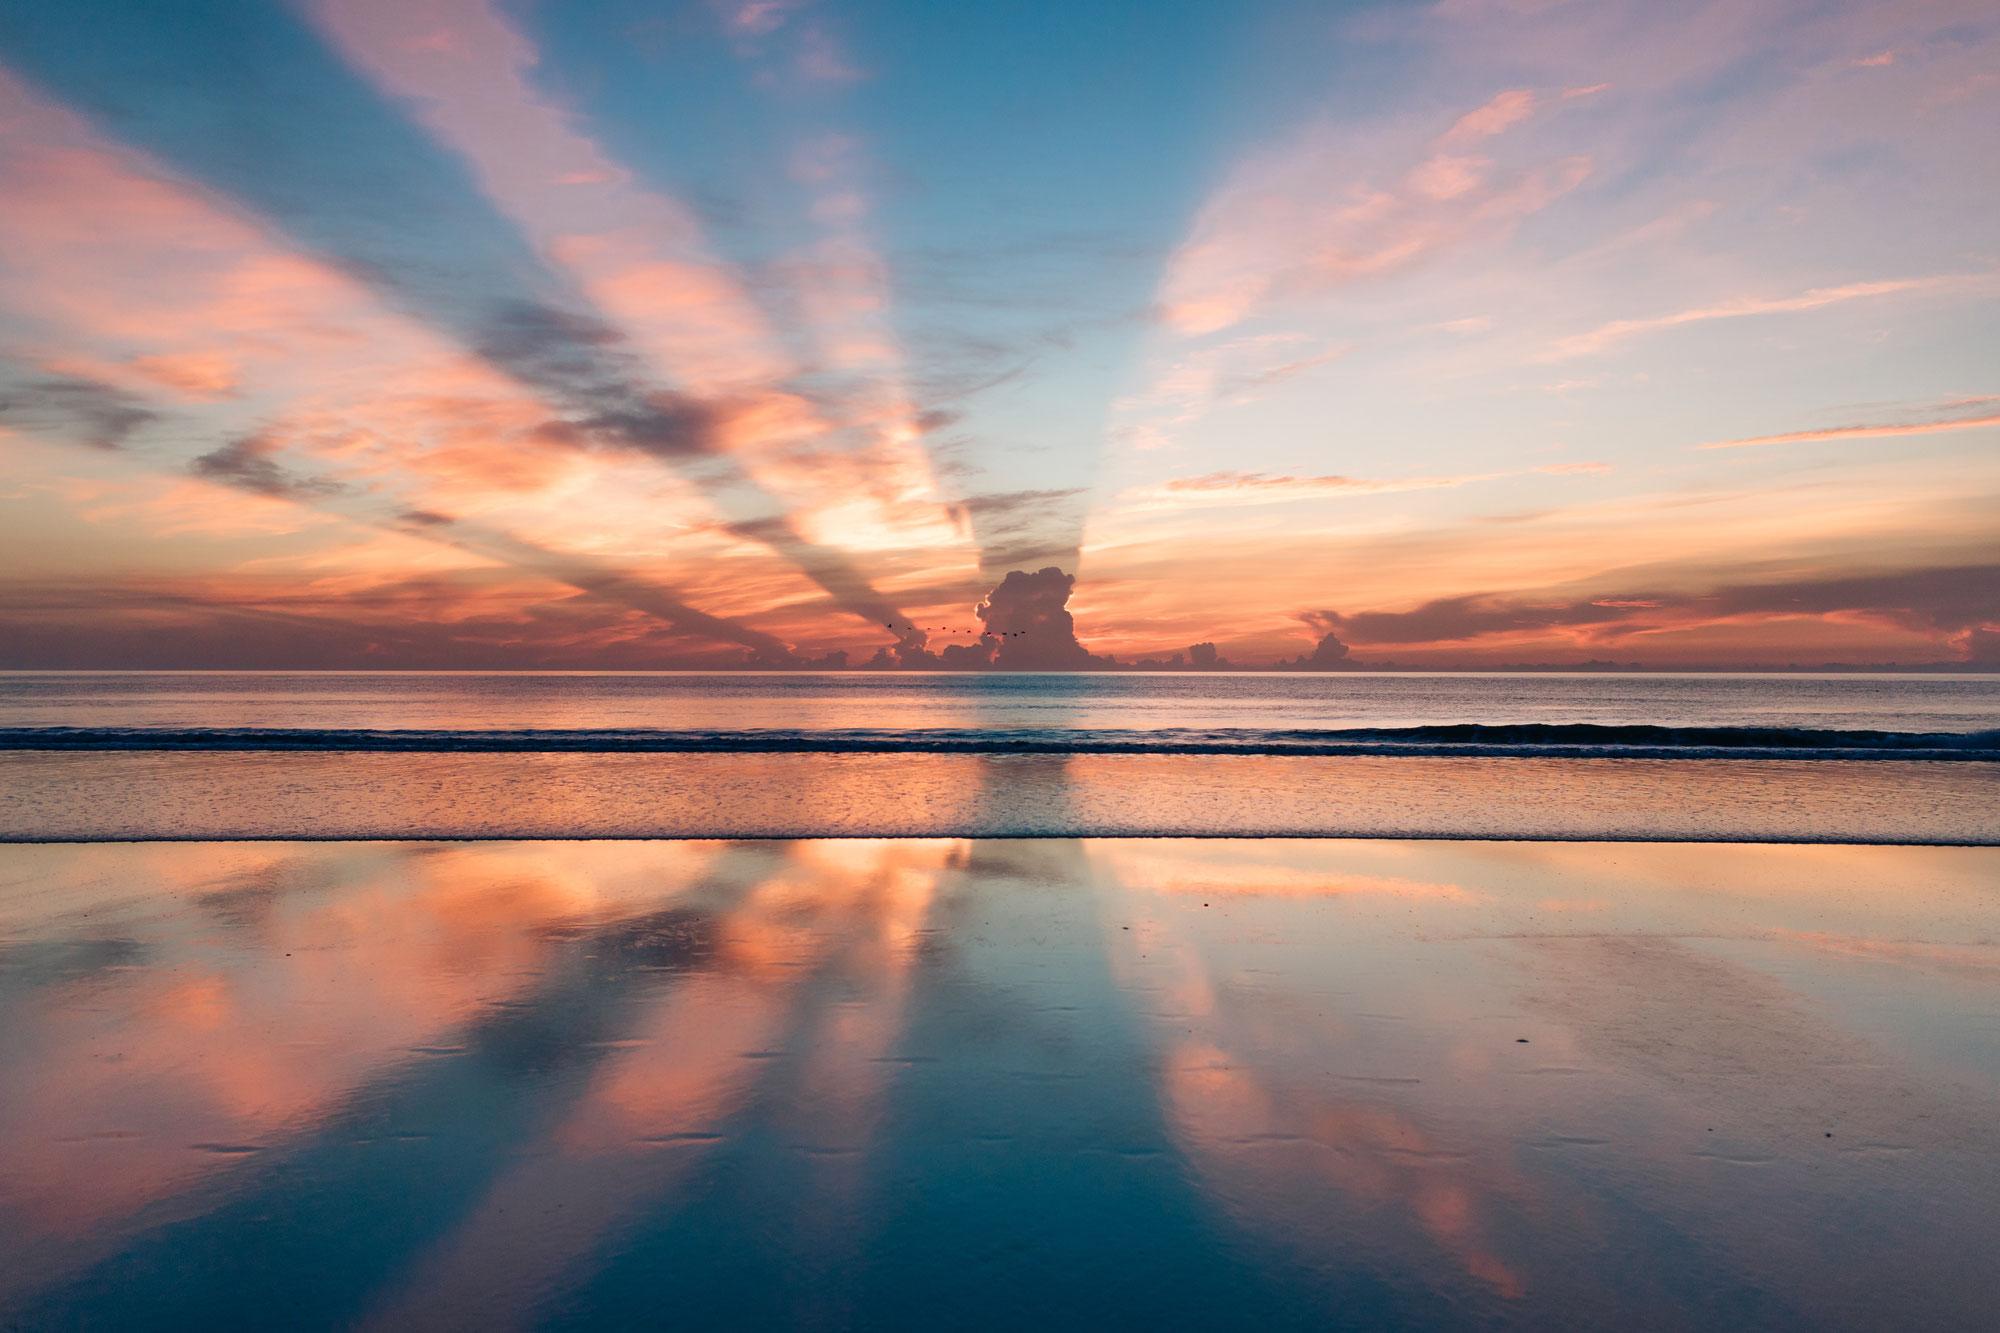 Nieuwe maan 12 april 2021 ♥ Fran Tielemans ♥ Lichtwerkers Nederland